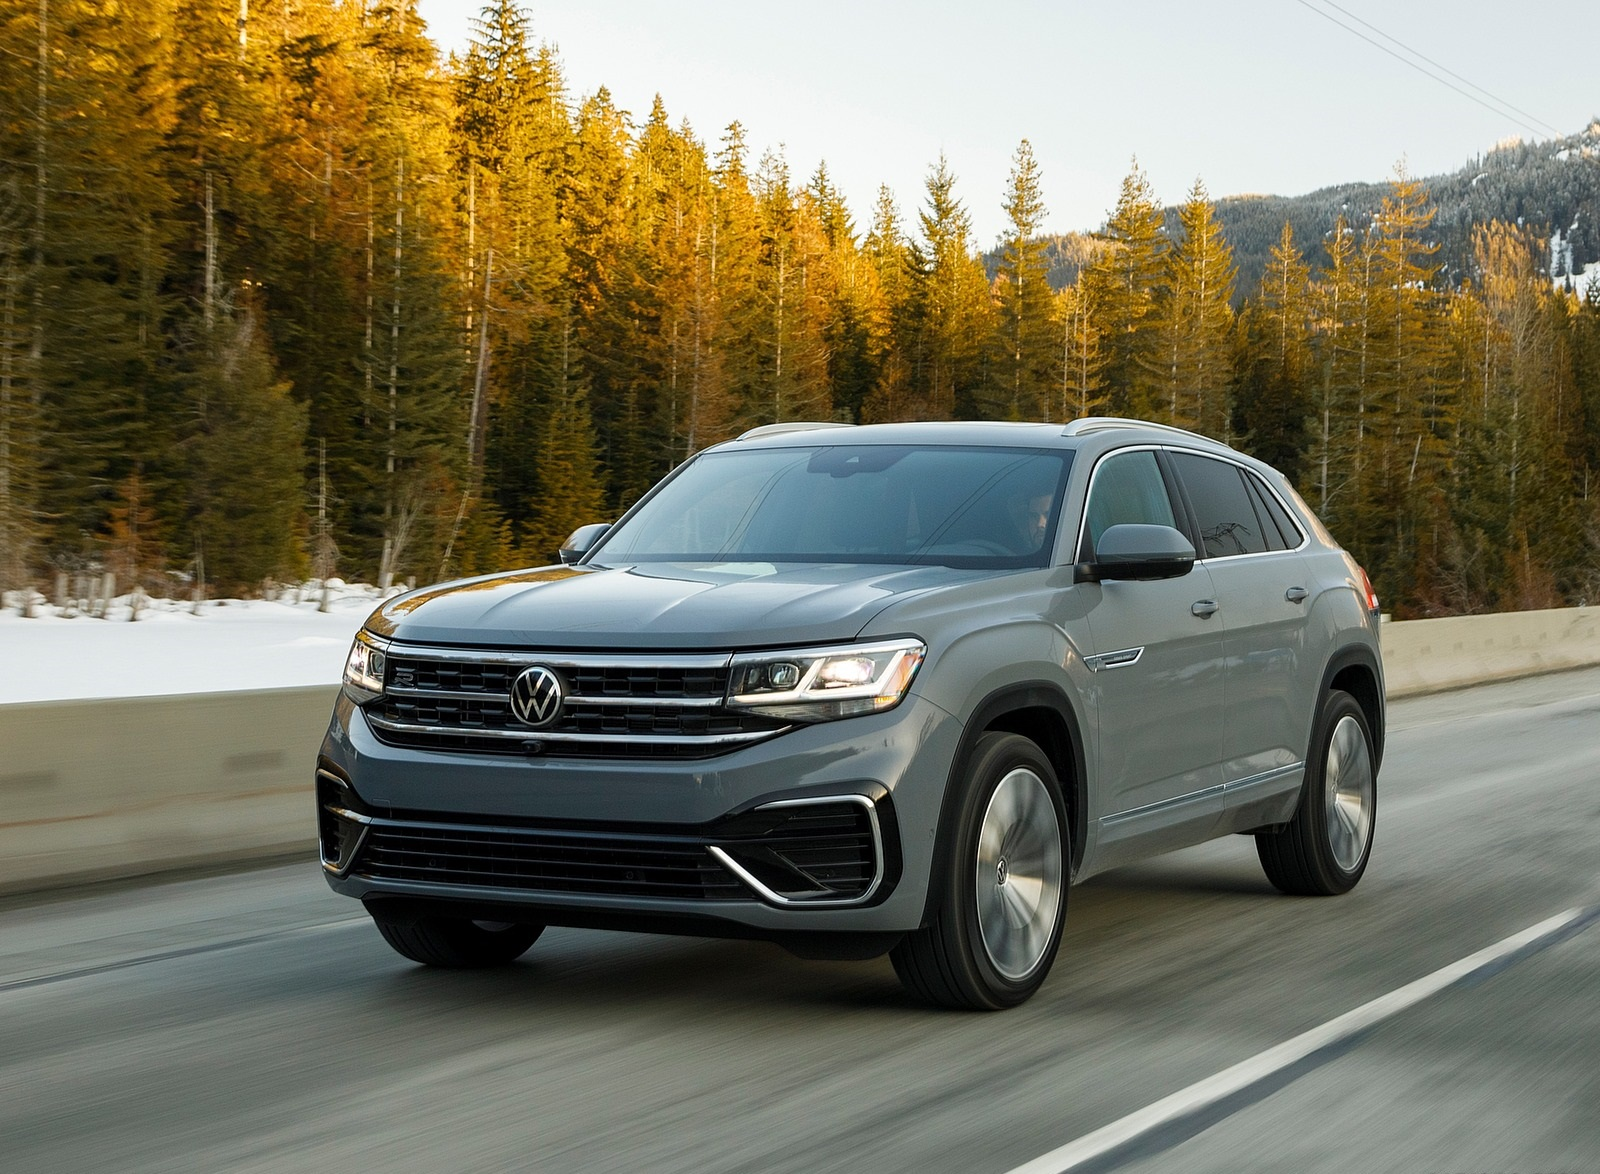 2020 Volkswagen Atlas Cross Sport SEL Premium R Line (Color: Pure Gray) Front Three-Quarter Wallpapers (9)